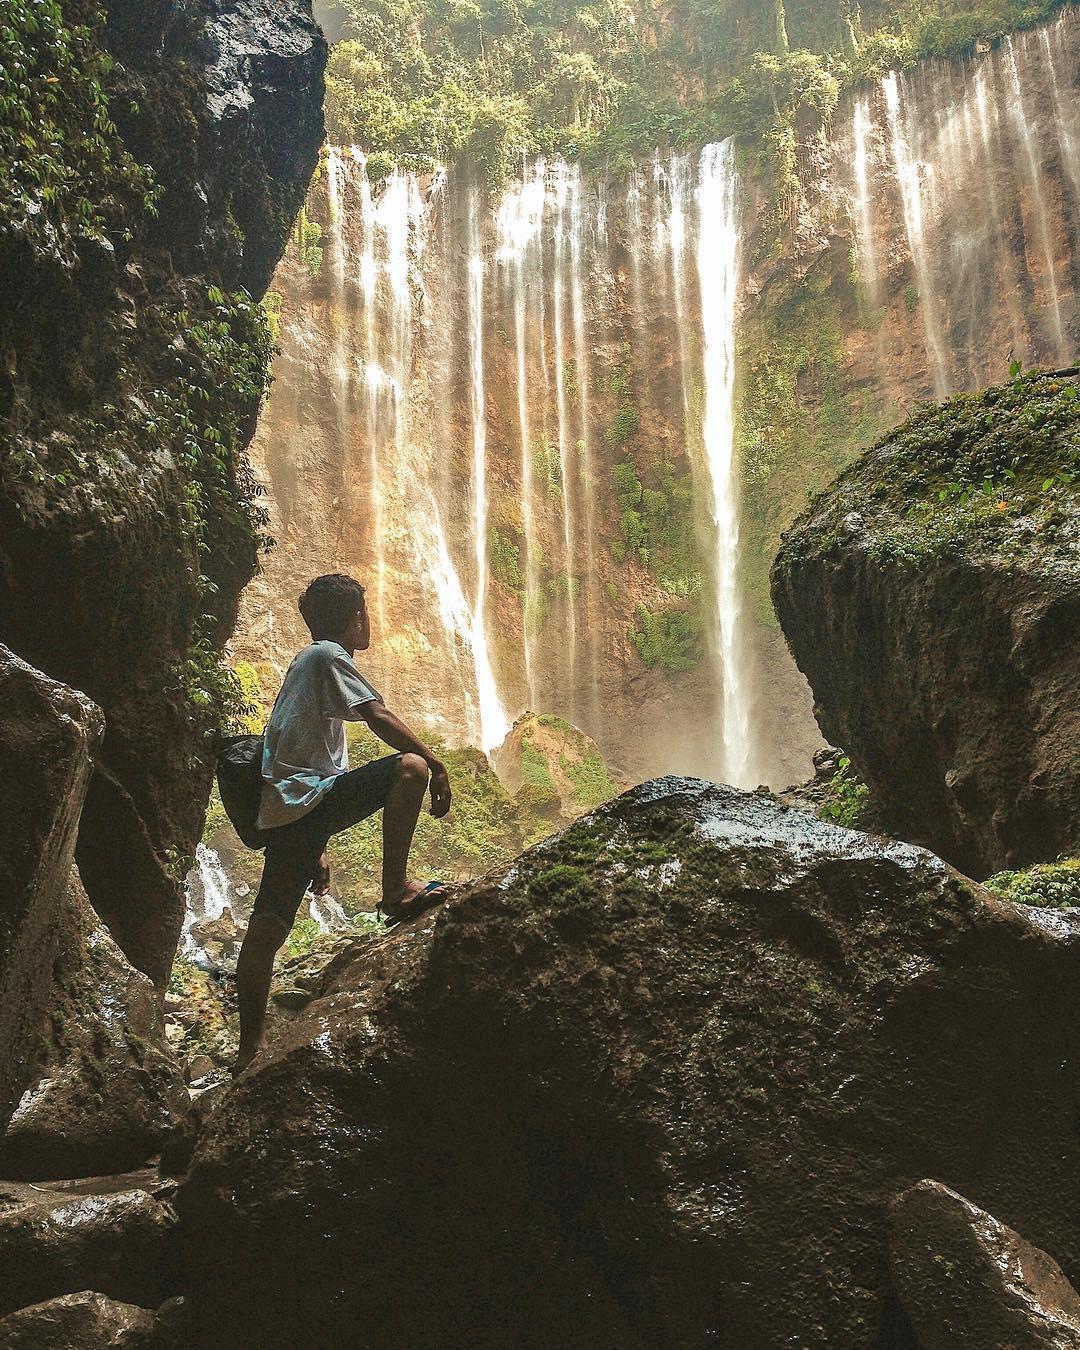 Turun ke Sungai Glidih, Turun ke Sungai Glidih Malang, Malang, Dolan Dolen, Dolaners Turun ke Sungai Glidih via misbahnagi - Dolan Dolen